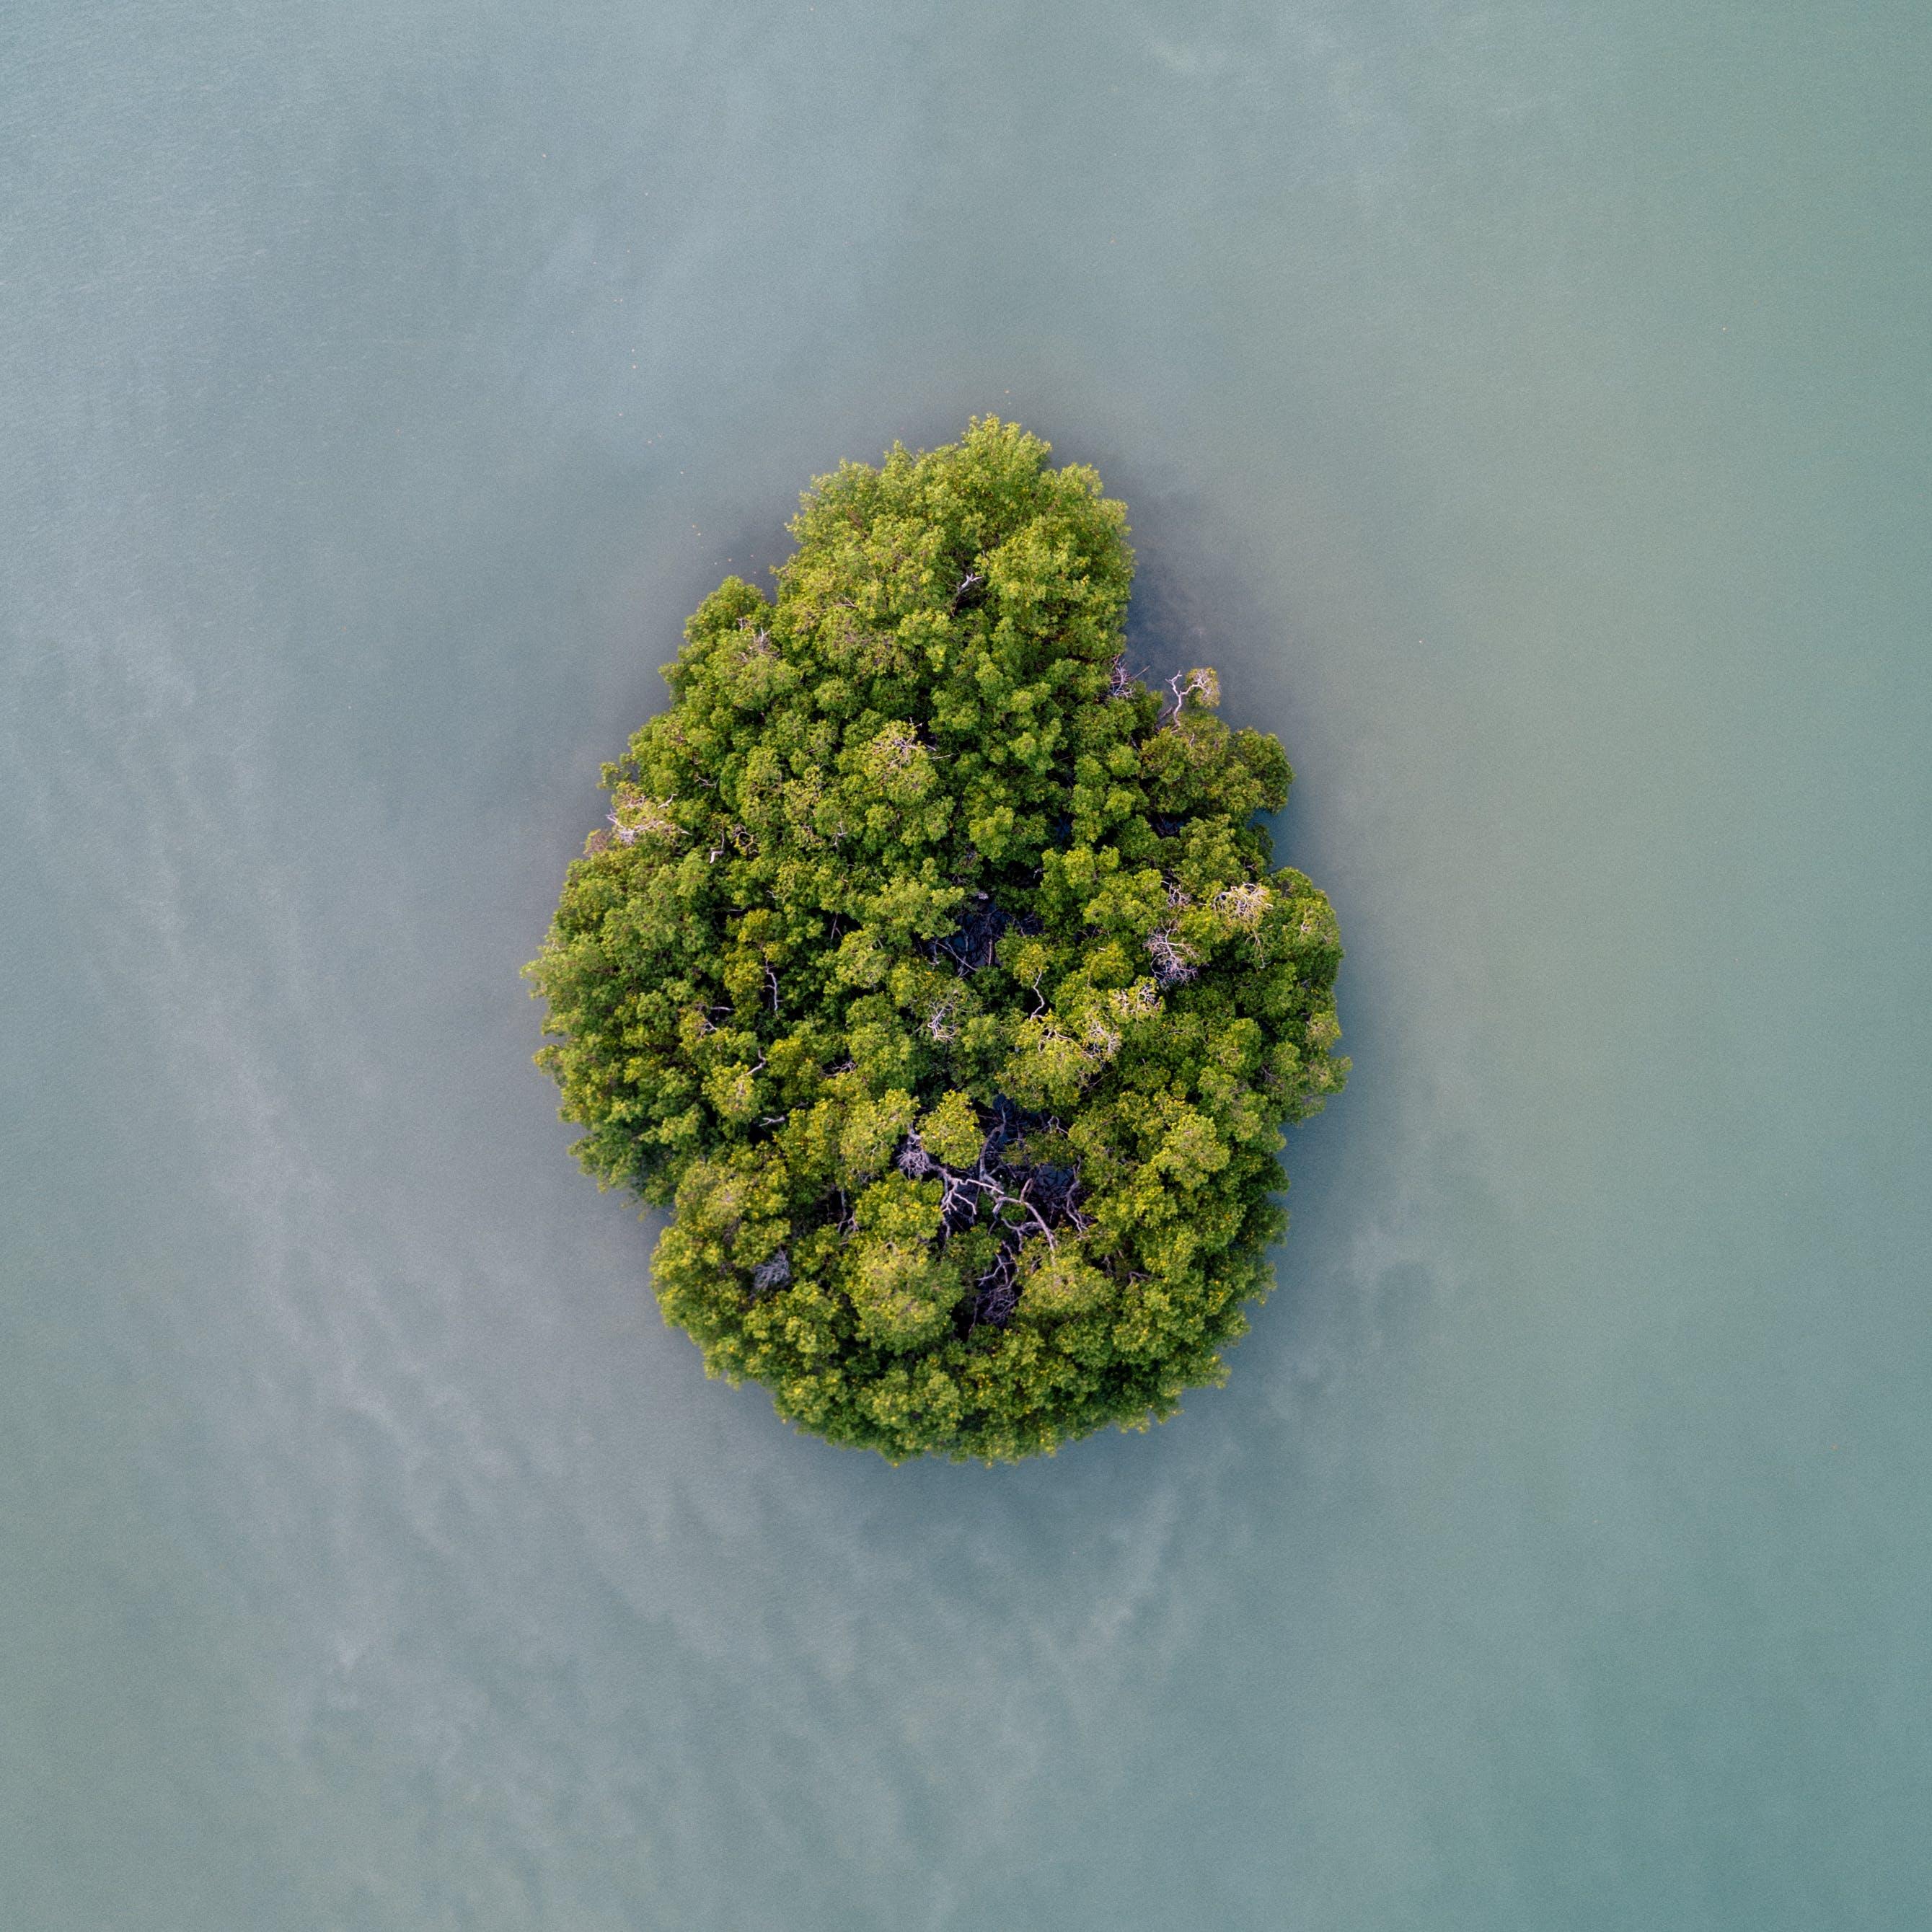 drone, grow, island